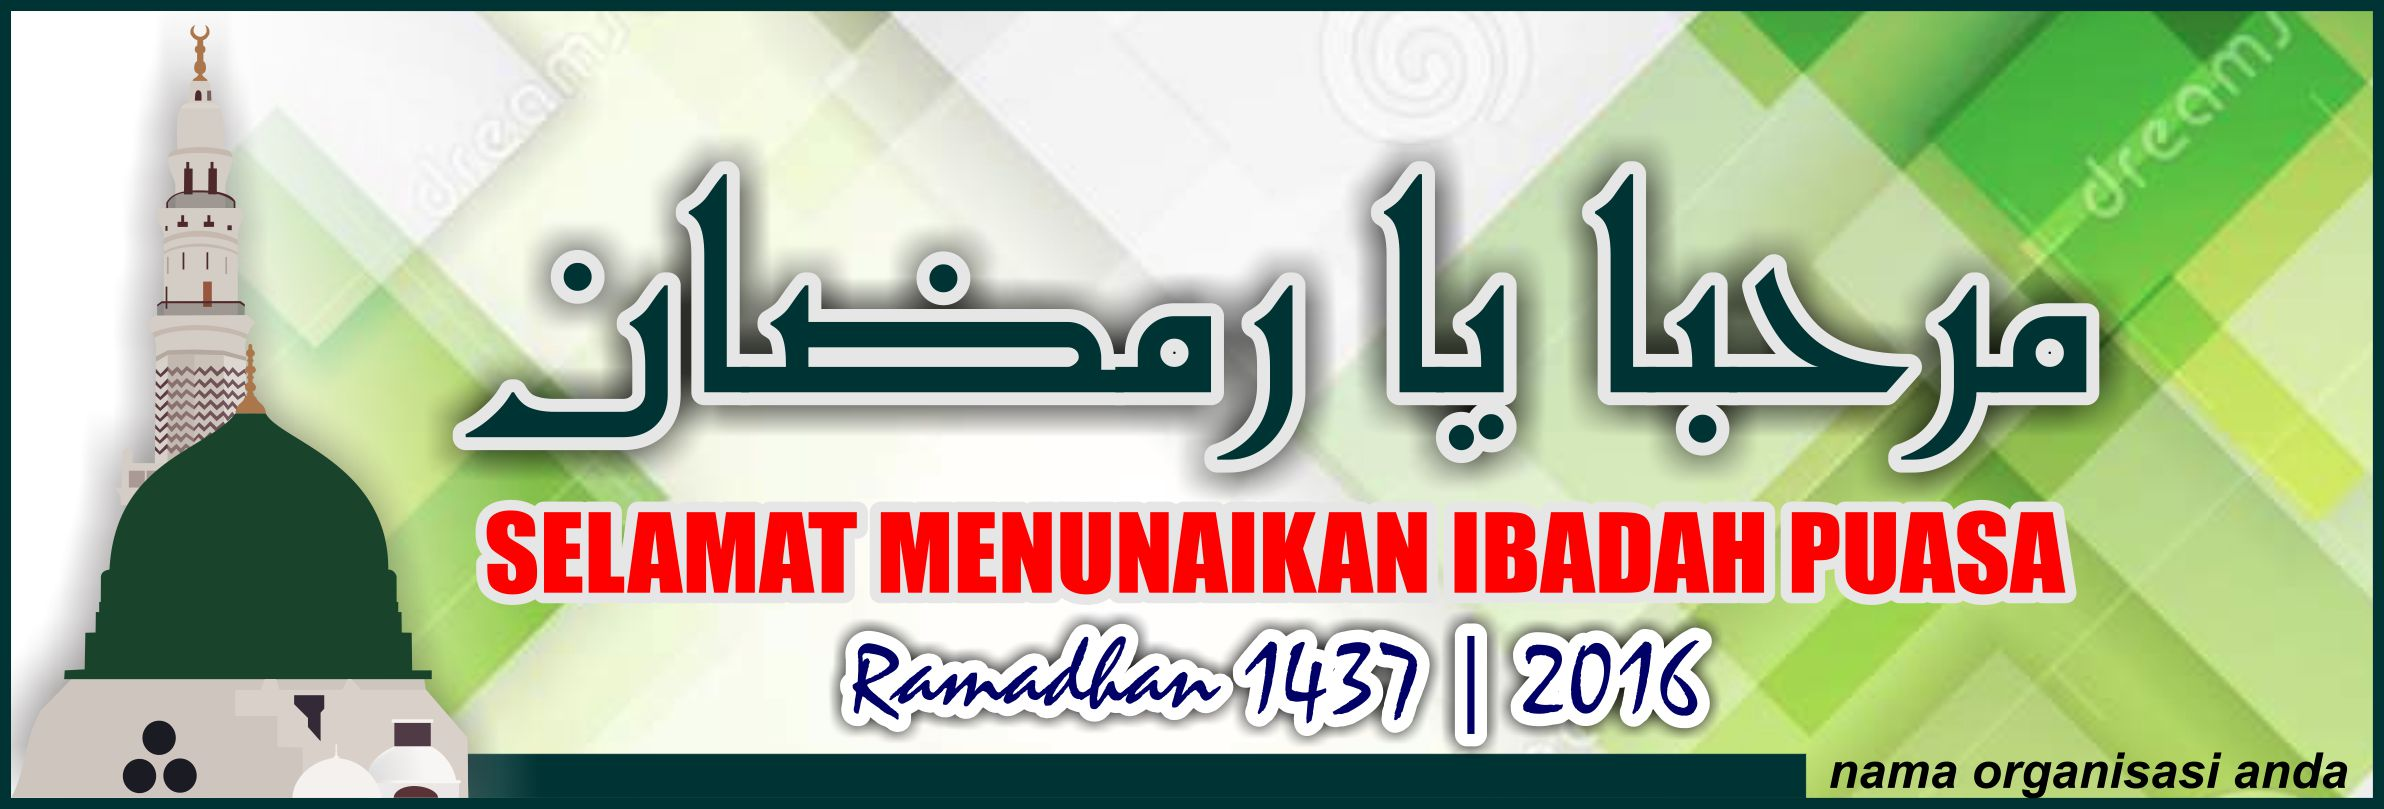 01 Banner Spanduk Ramadhan 3mx1m 2016 M 1437